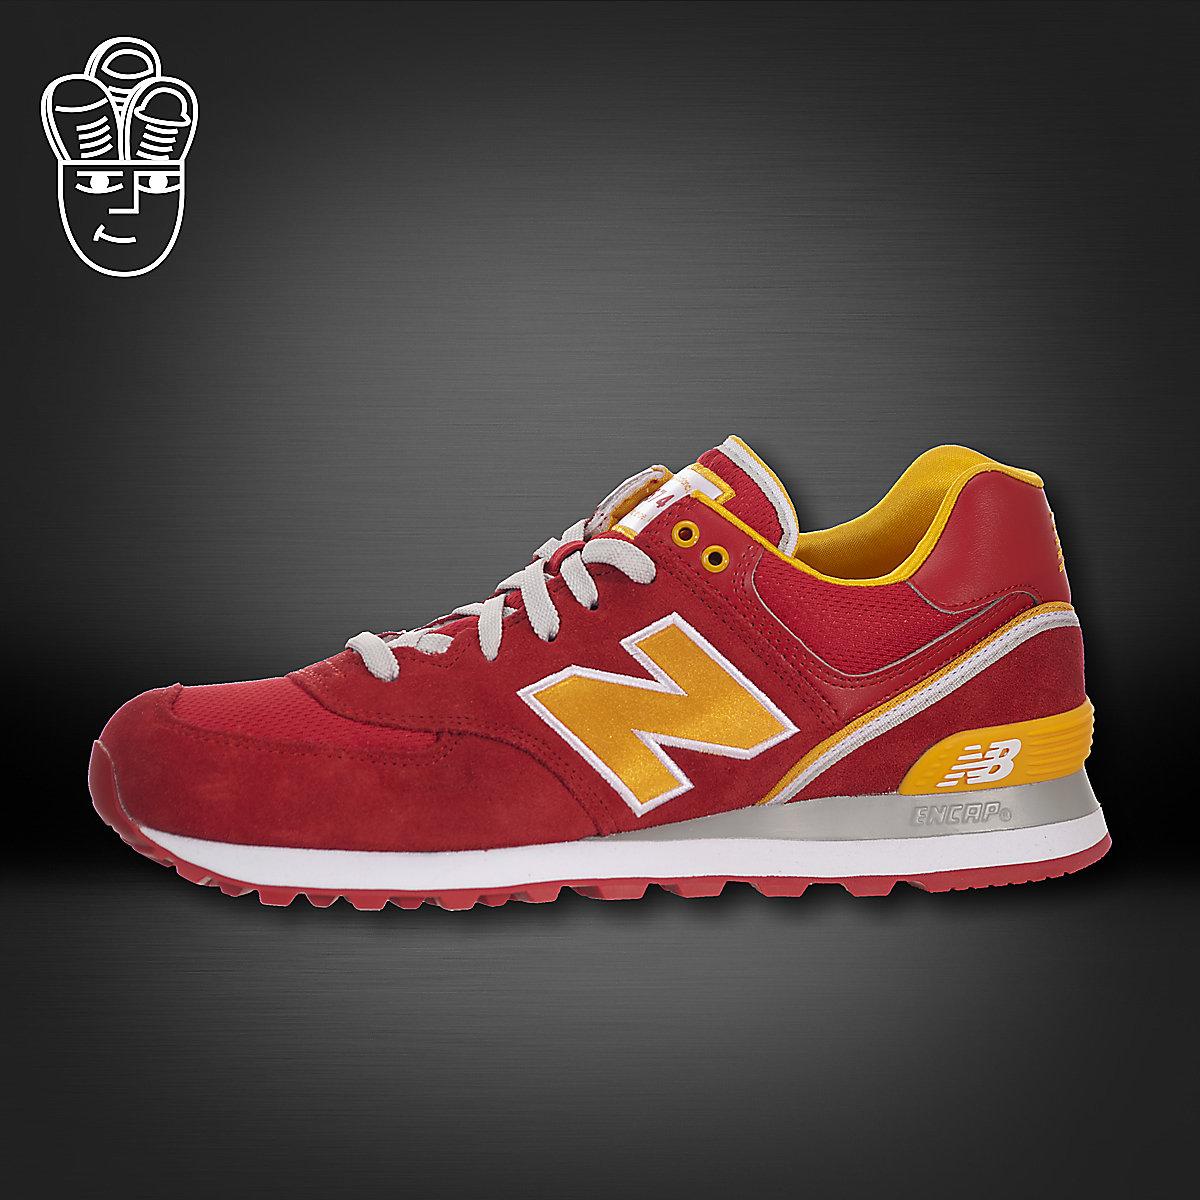 New Balance 574 NB男鞋 棒球夹克套装休闲鞋 总统慢跑鞋ml574sjy